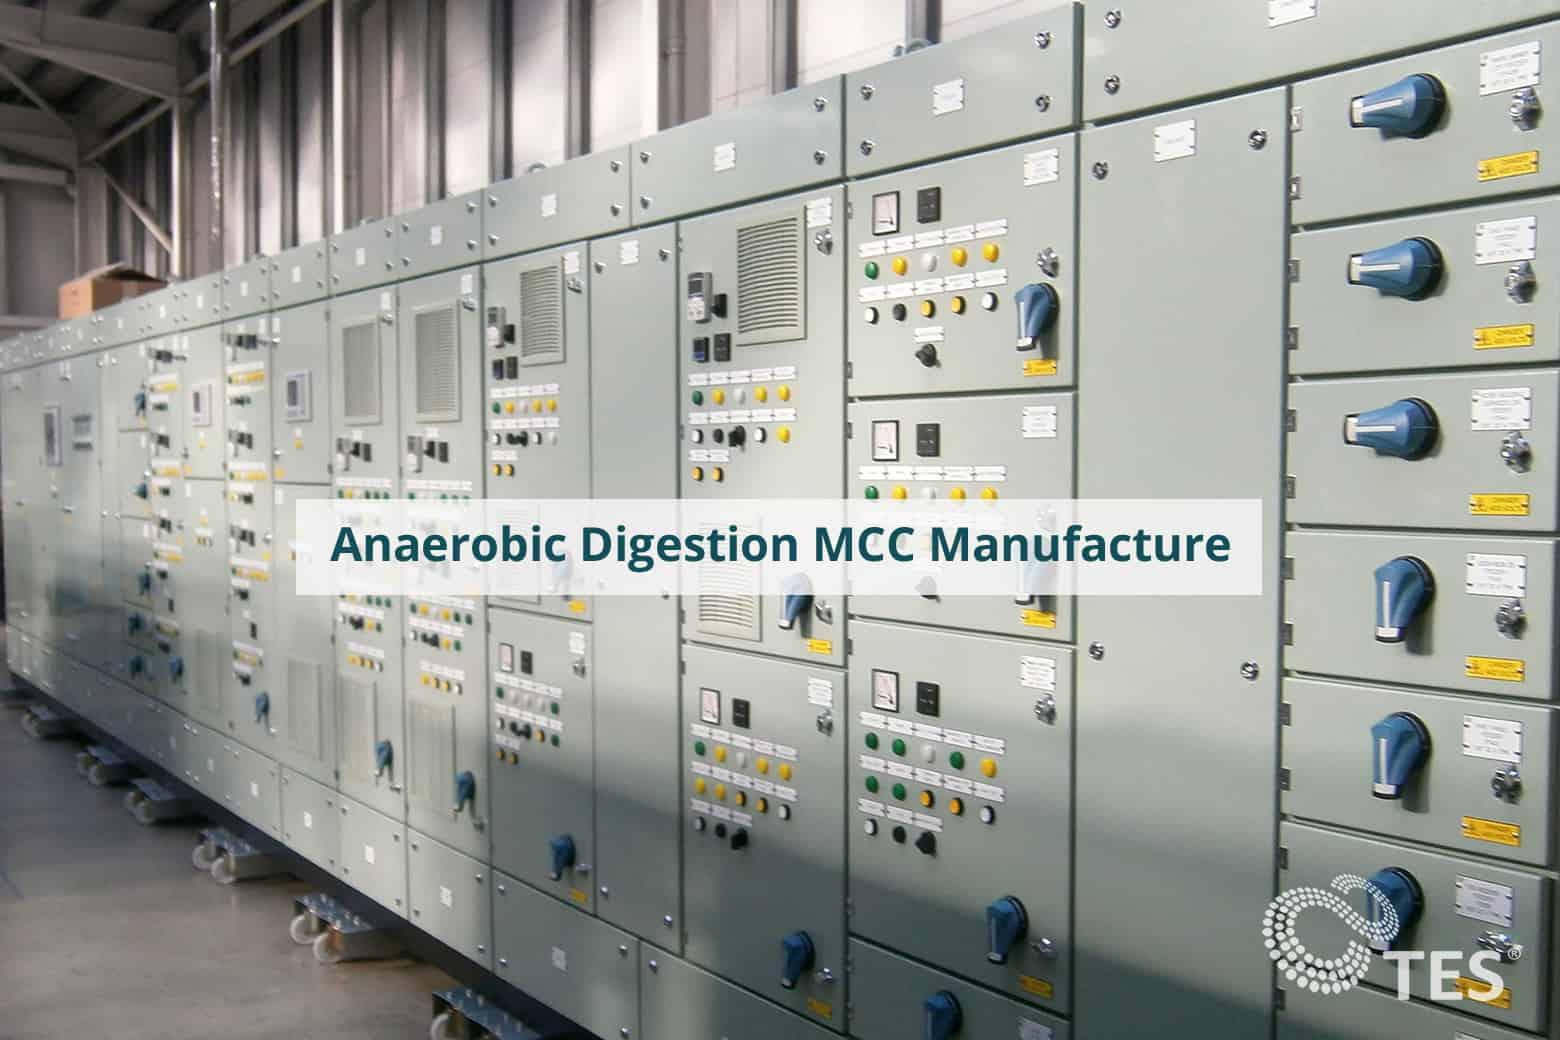 Anaerobic Digestion MCC Manufacture